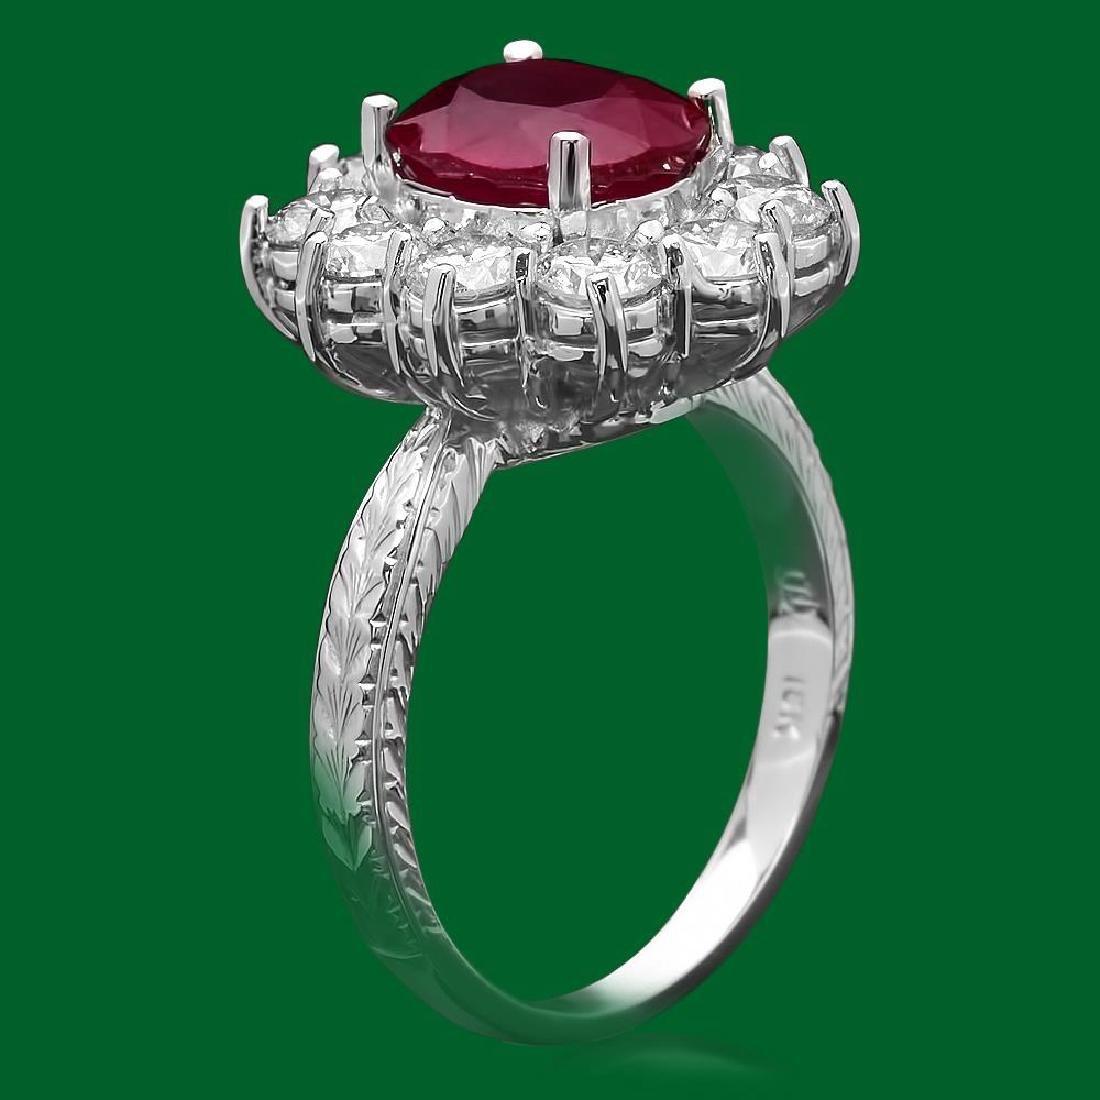 14k Gold 3.21ct Ruby 2.02ct Diamond Ring - 2